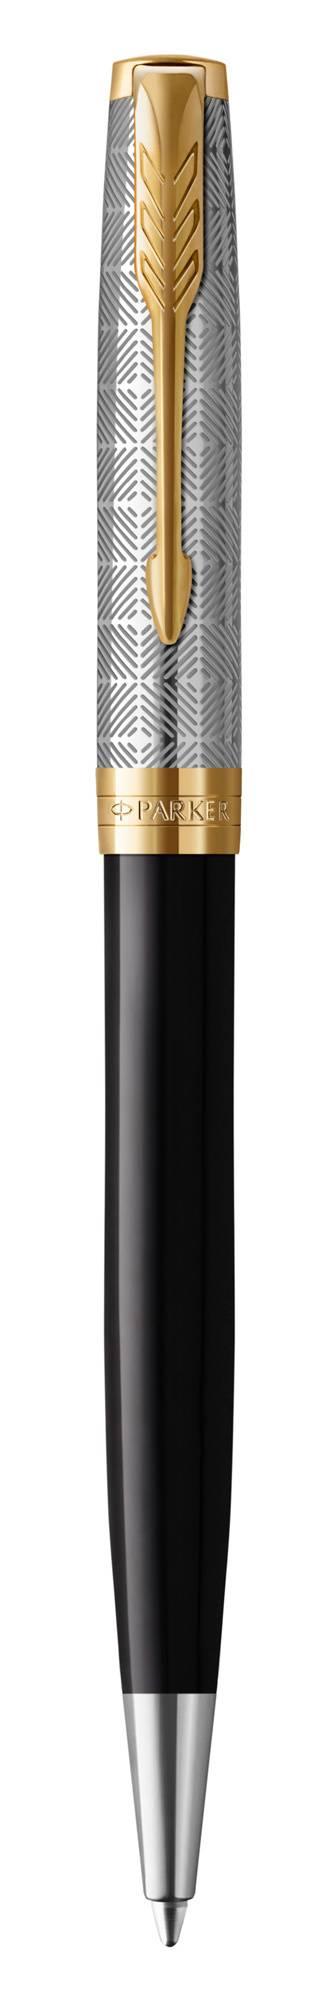 Ручка шариковая Parker Sonnet Premium K537 Metal Black GT (2119787) - фото 1